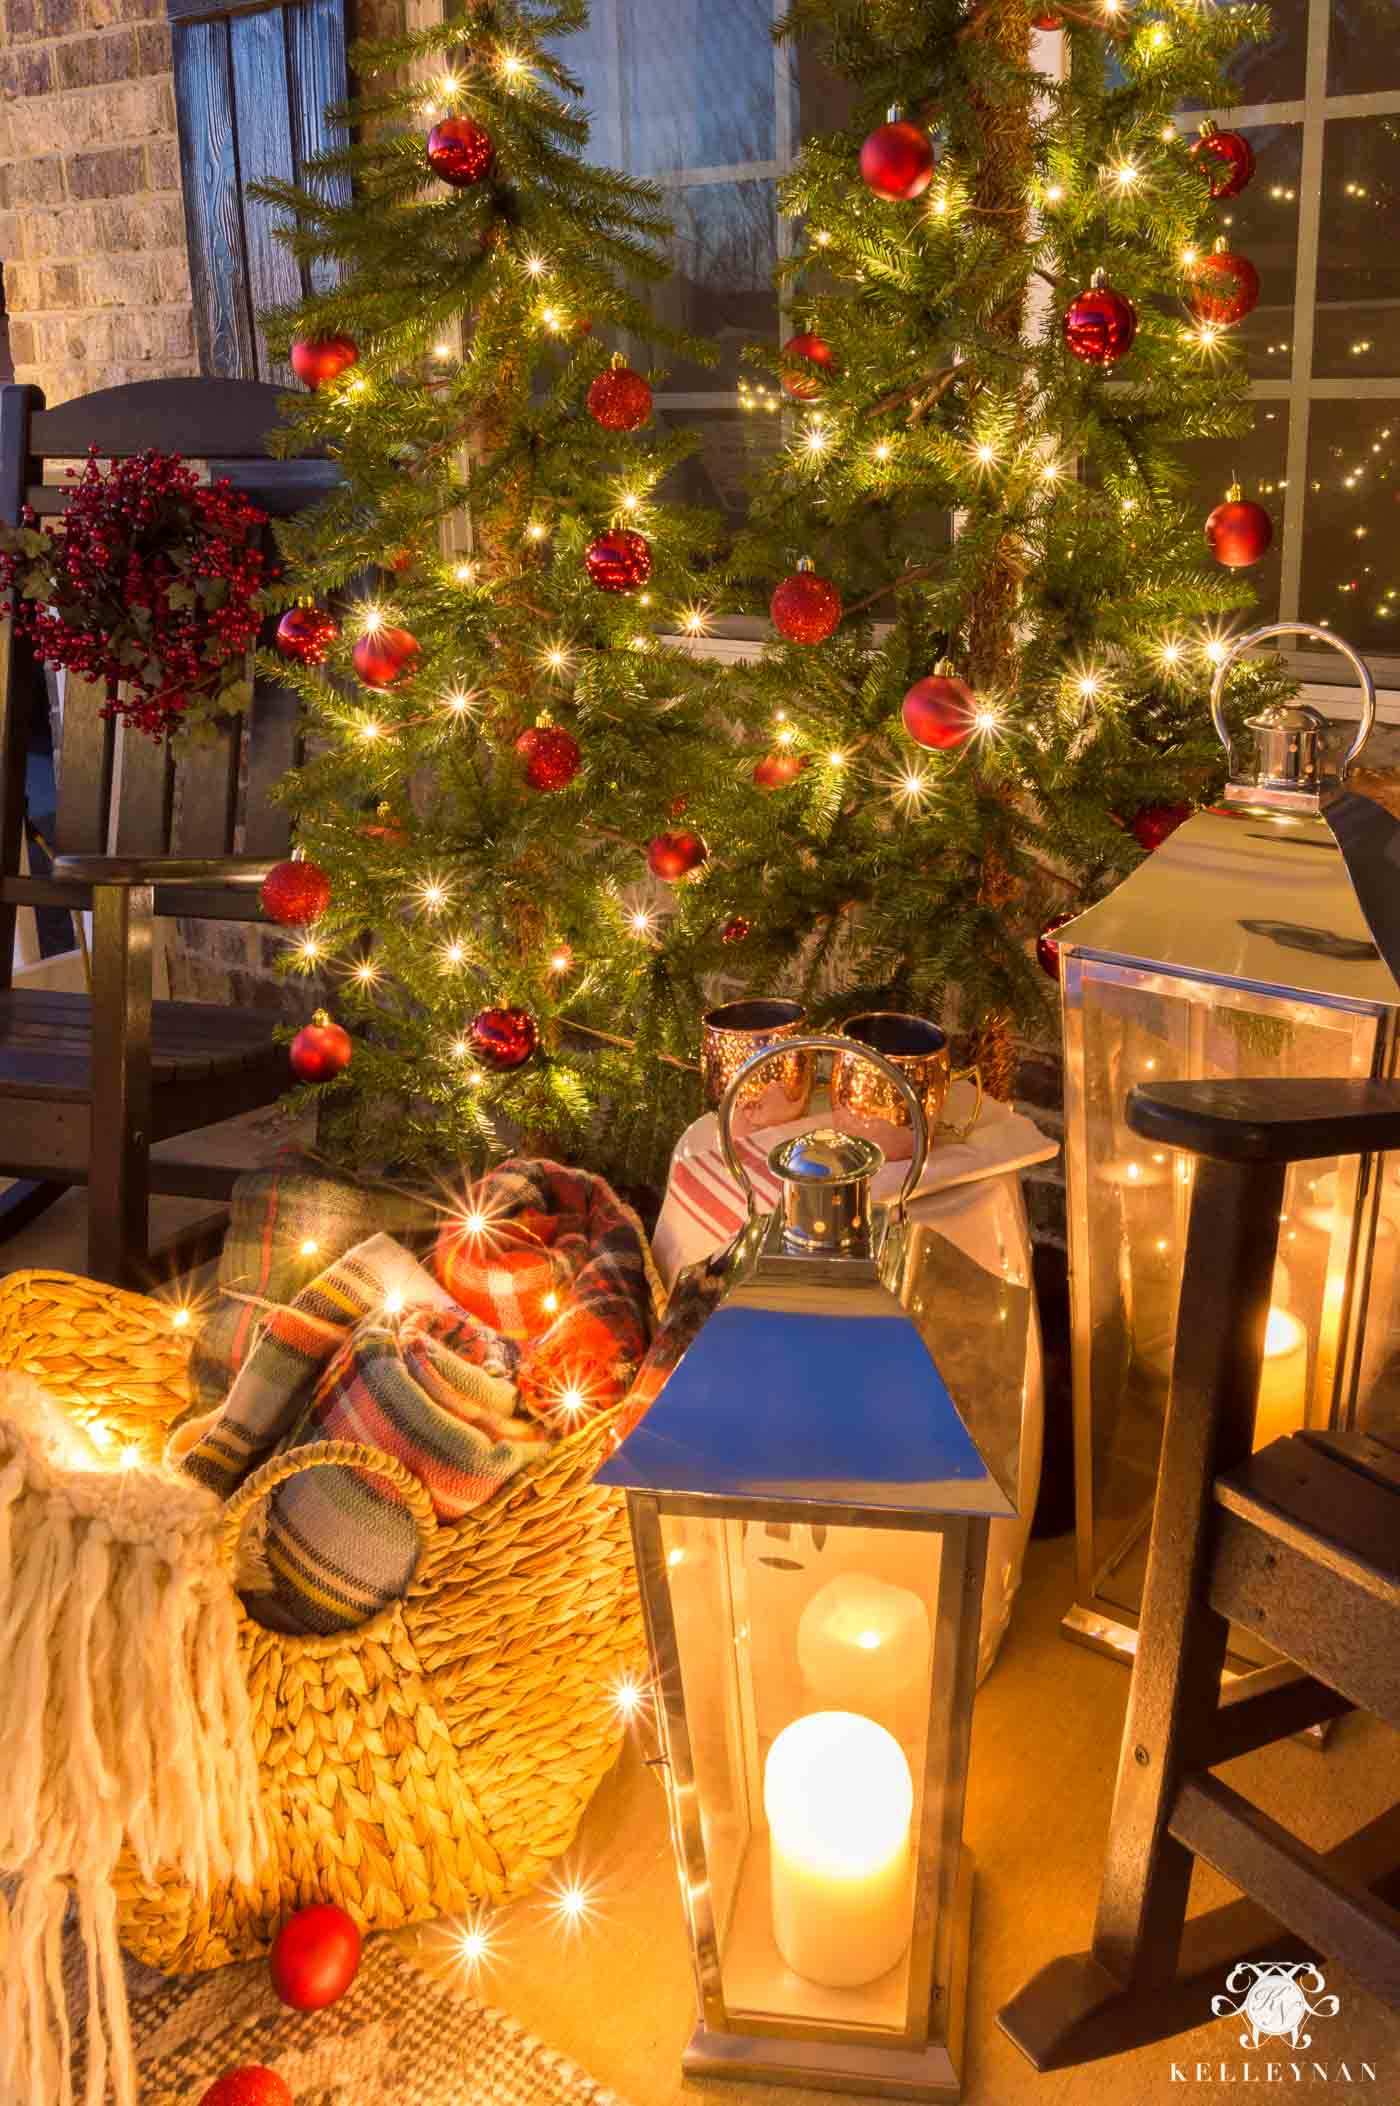 Cozy Christmas Front Porch - Kelley Nan